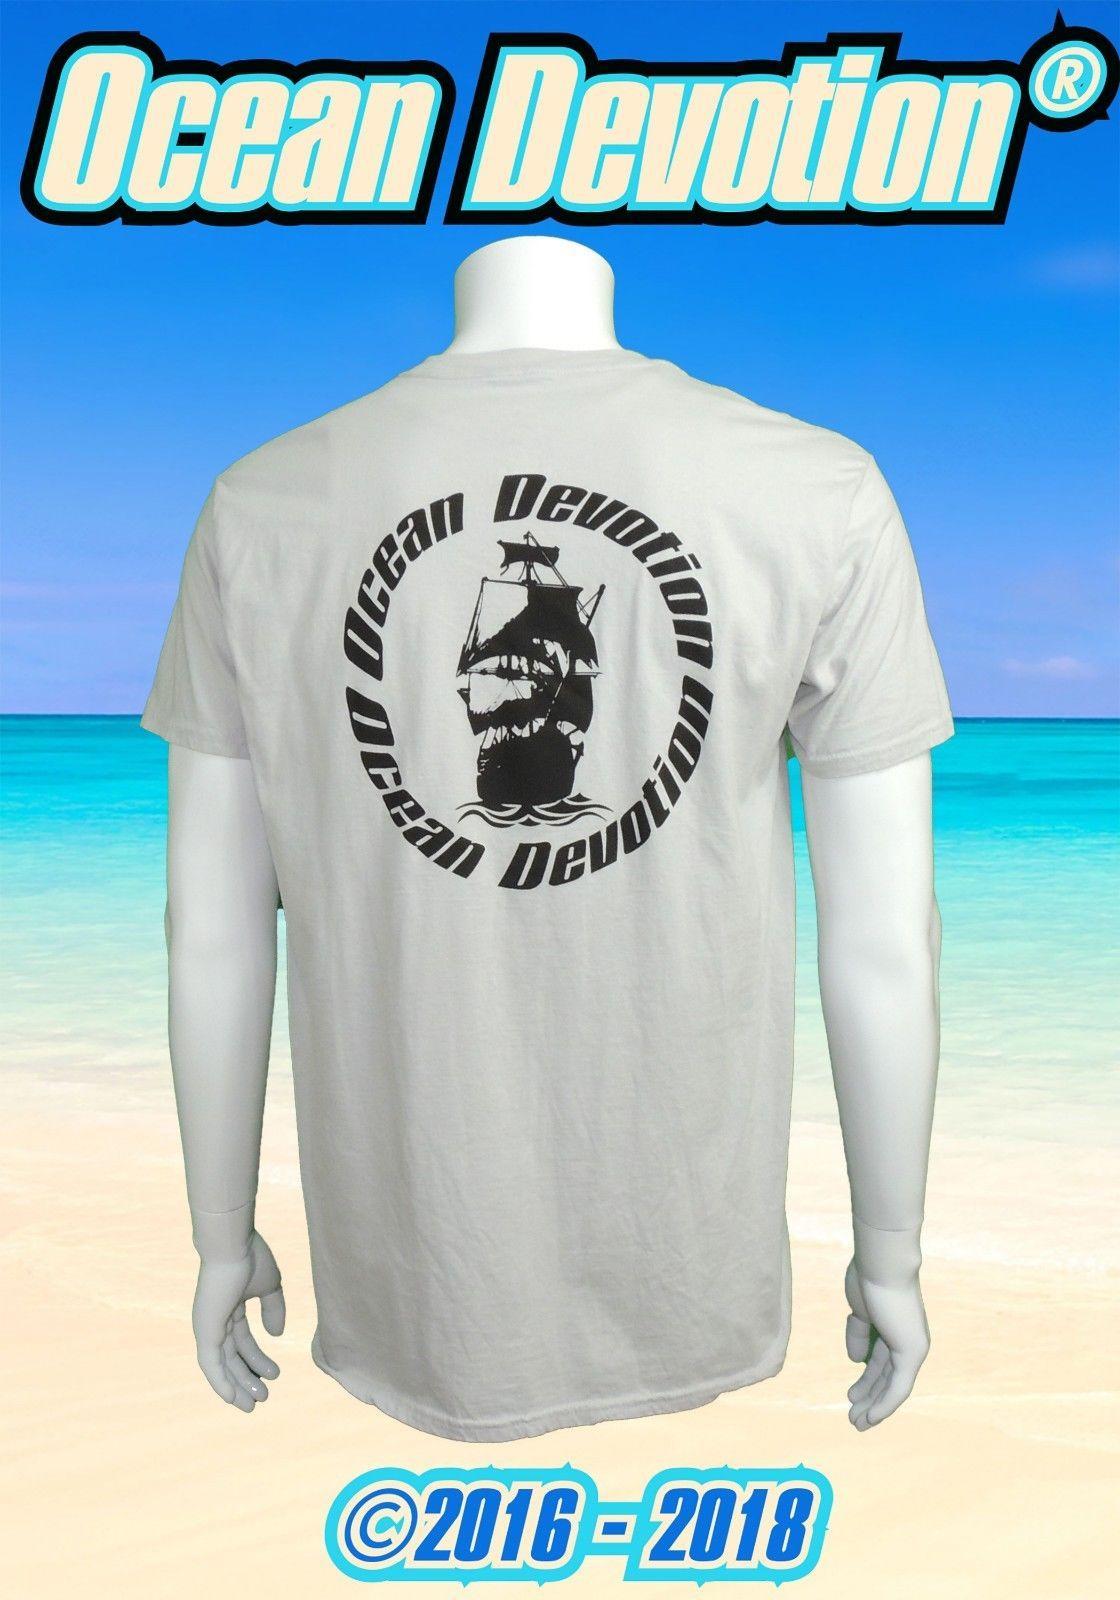 f58543a6d94 Pirate Ship Ocean Devotion Mens T Shirt Sailing Rum Beach Sailboat Salt  Life Funny Unisex Casual Tshirt Top Cool Team Shirts Crazy Shirt Designs  From ...